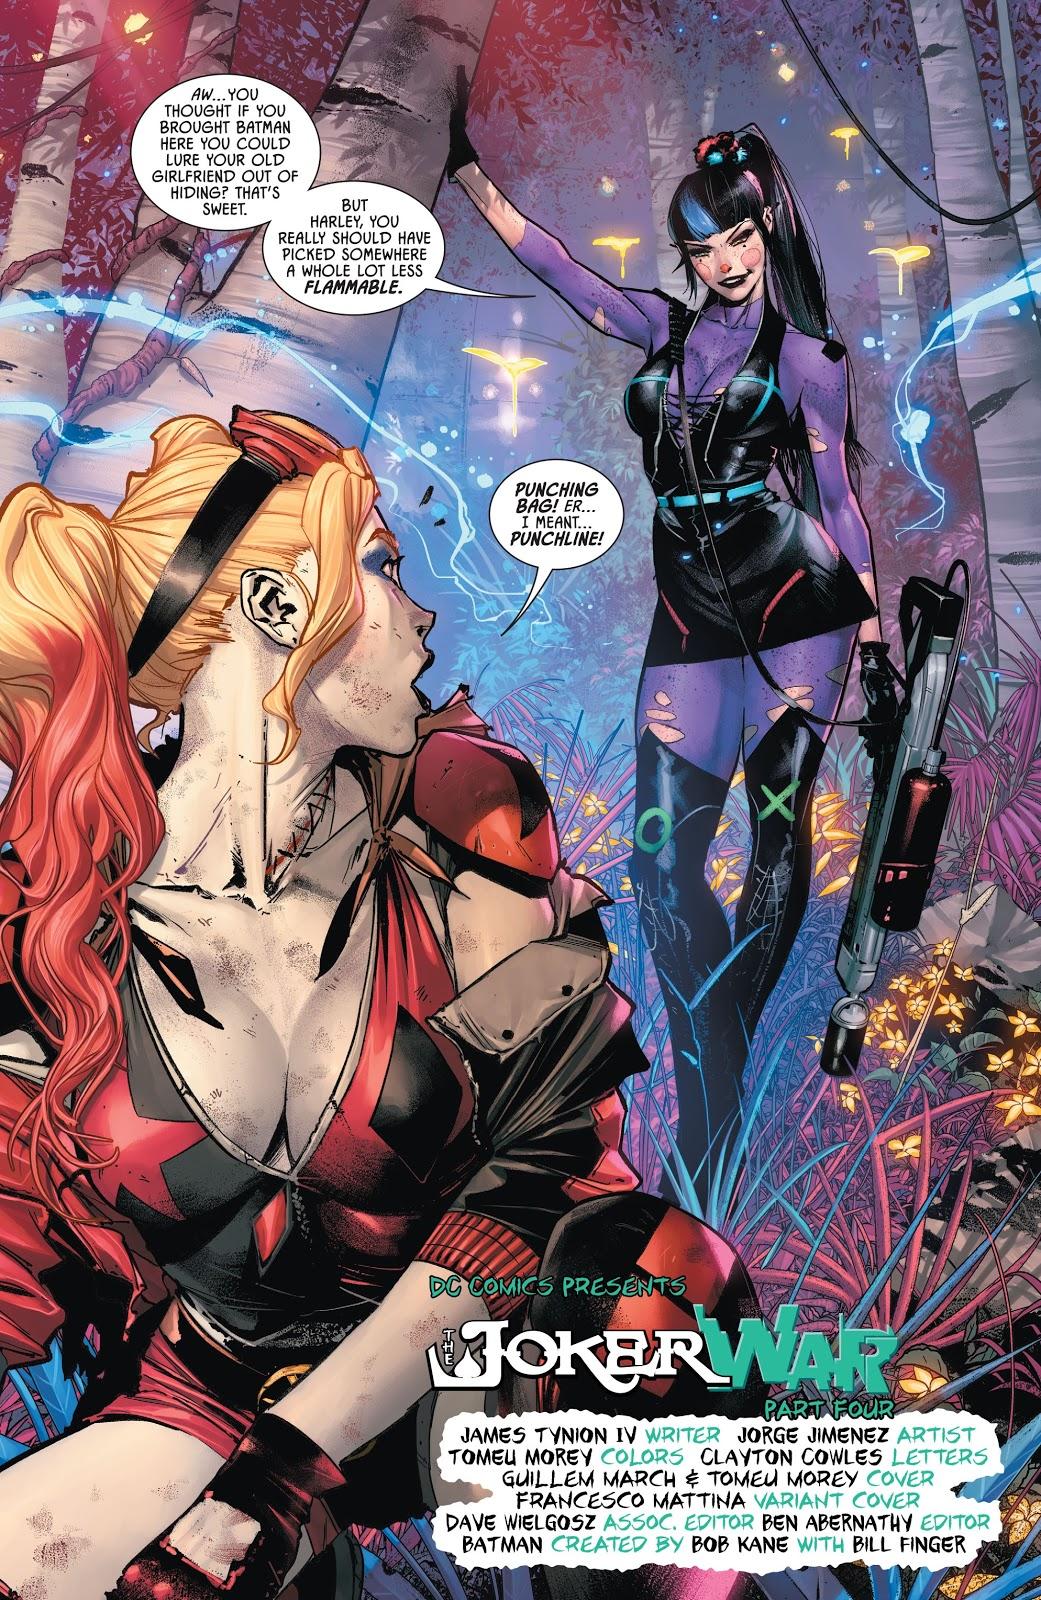 Punchline (Batman Vol. 3 #98)